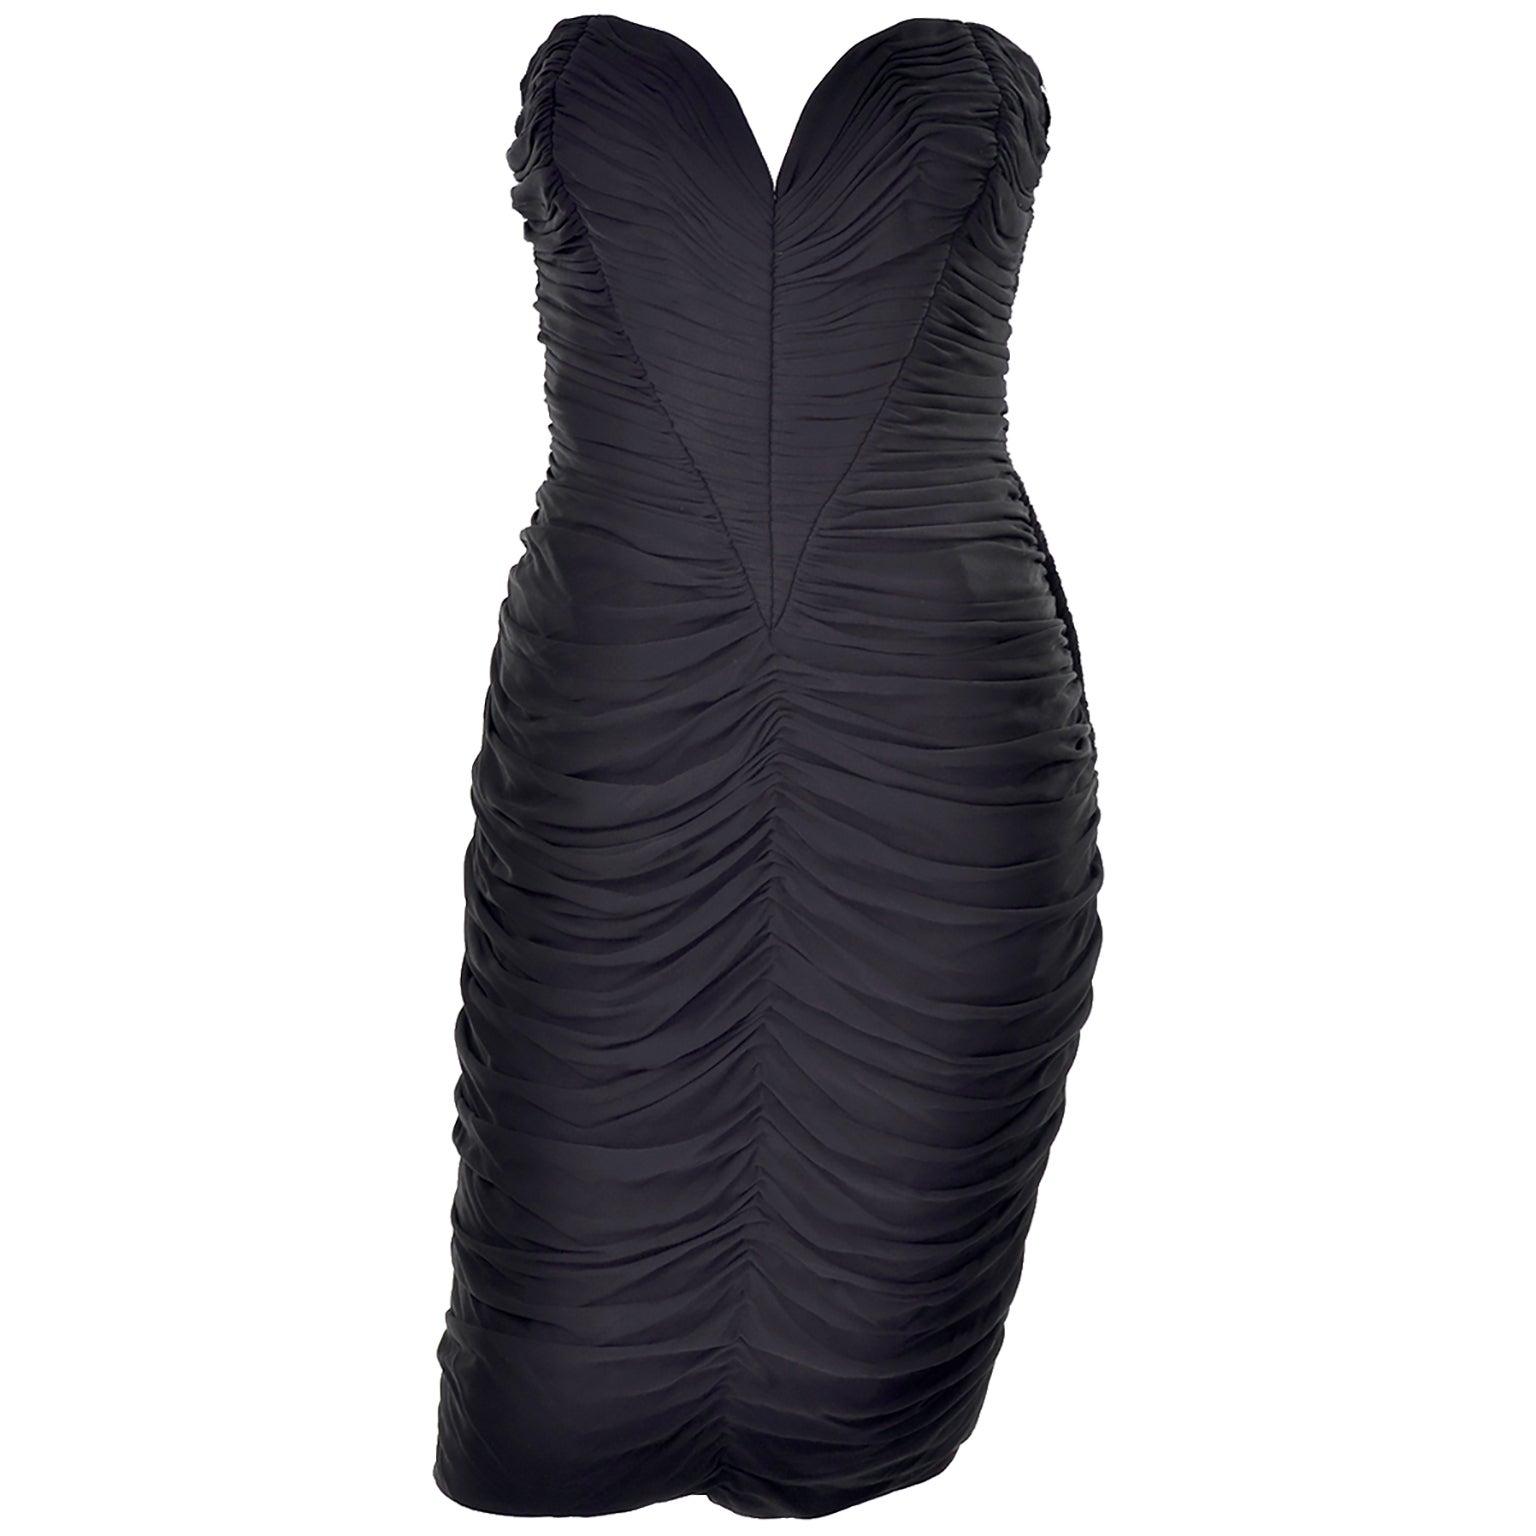 Vicky Tiel Documented Vintage 1986 Bodycon Strapless Black Dress W/ Heart Bodice